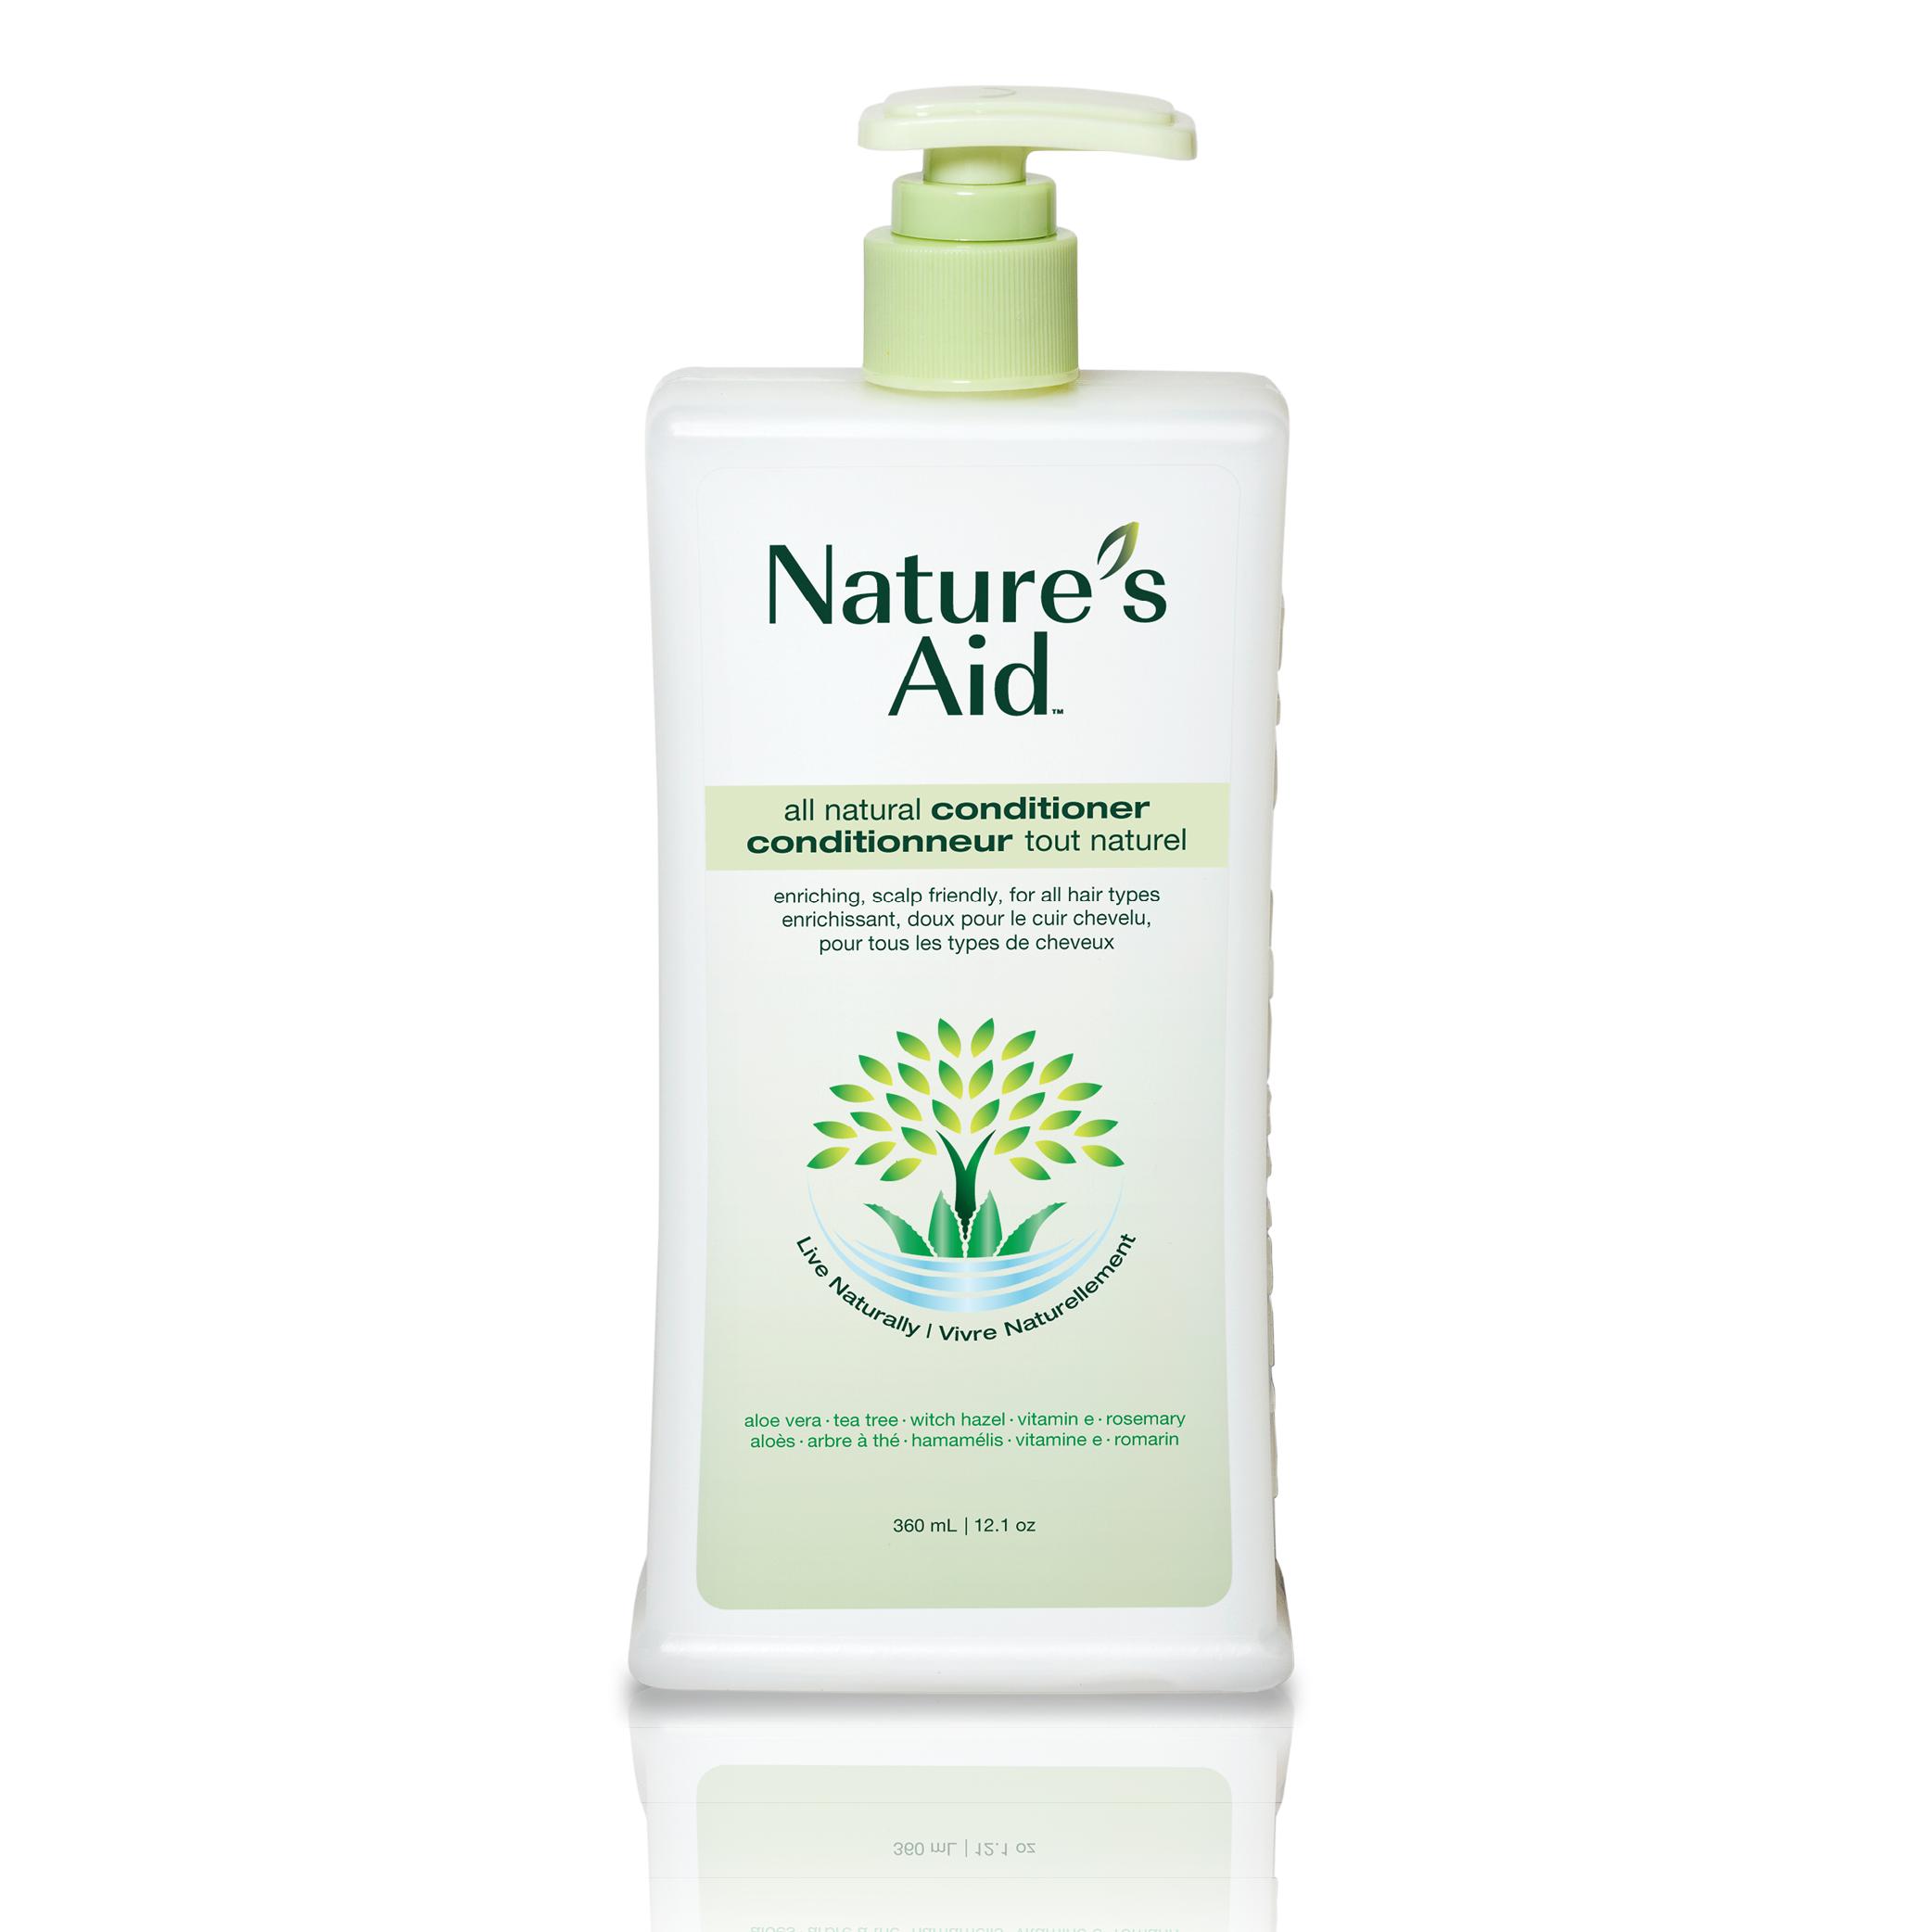 Natures Aid Skin Gel Acne